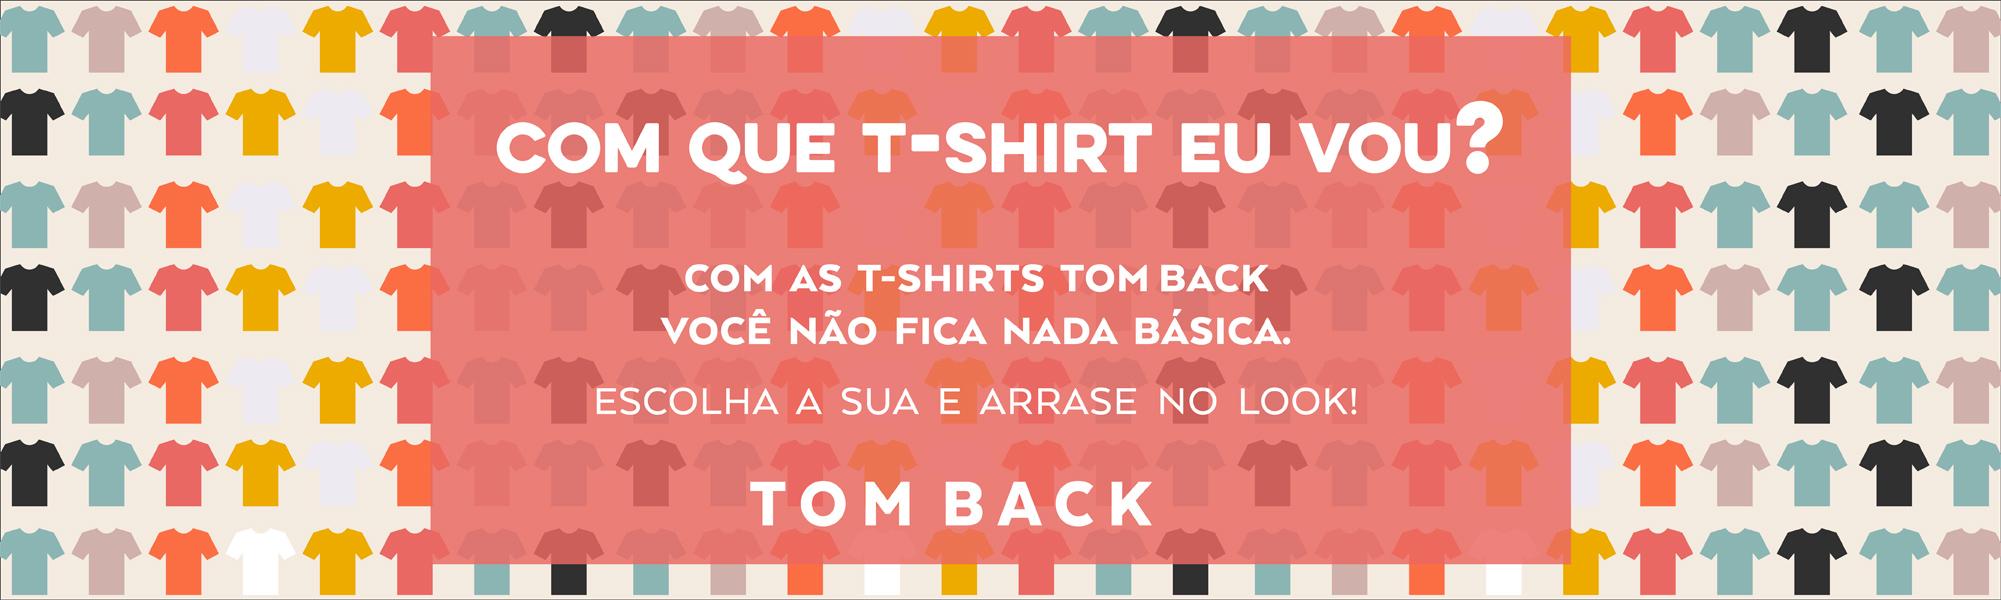 Tropical Vibes - T-shirts